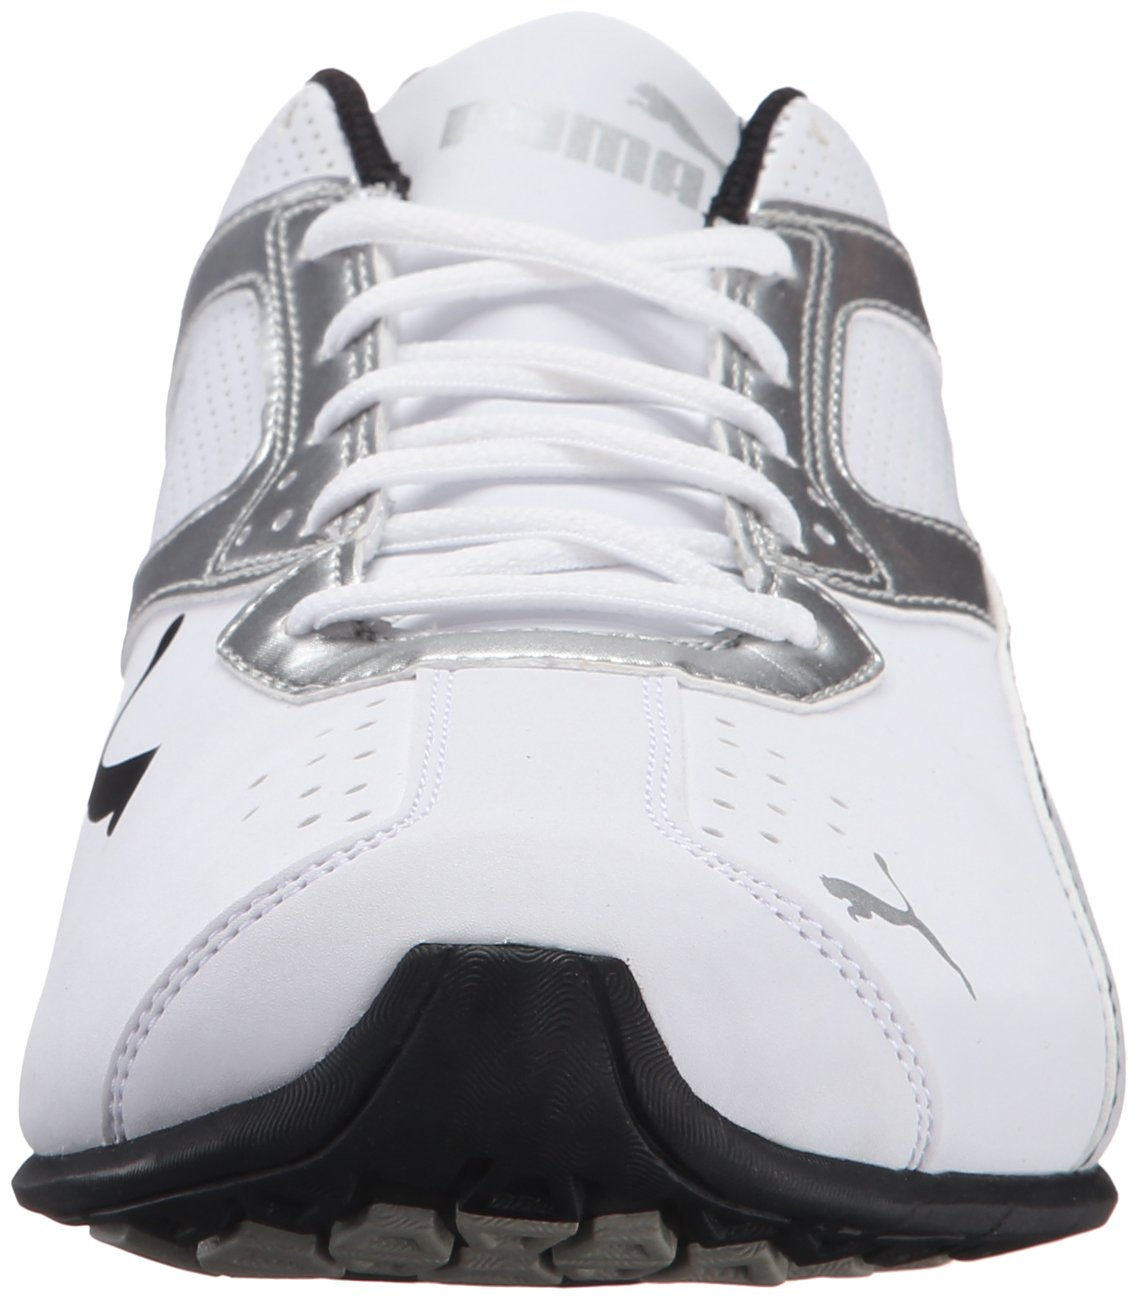 PUMA Men's Tazon 6 FM Puma White/ Puma Silver Running Shoe - 7.5 D(M) US by PUMA (Image #4)